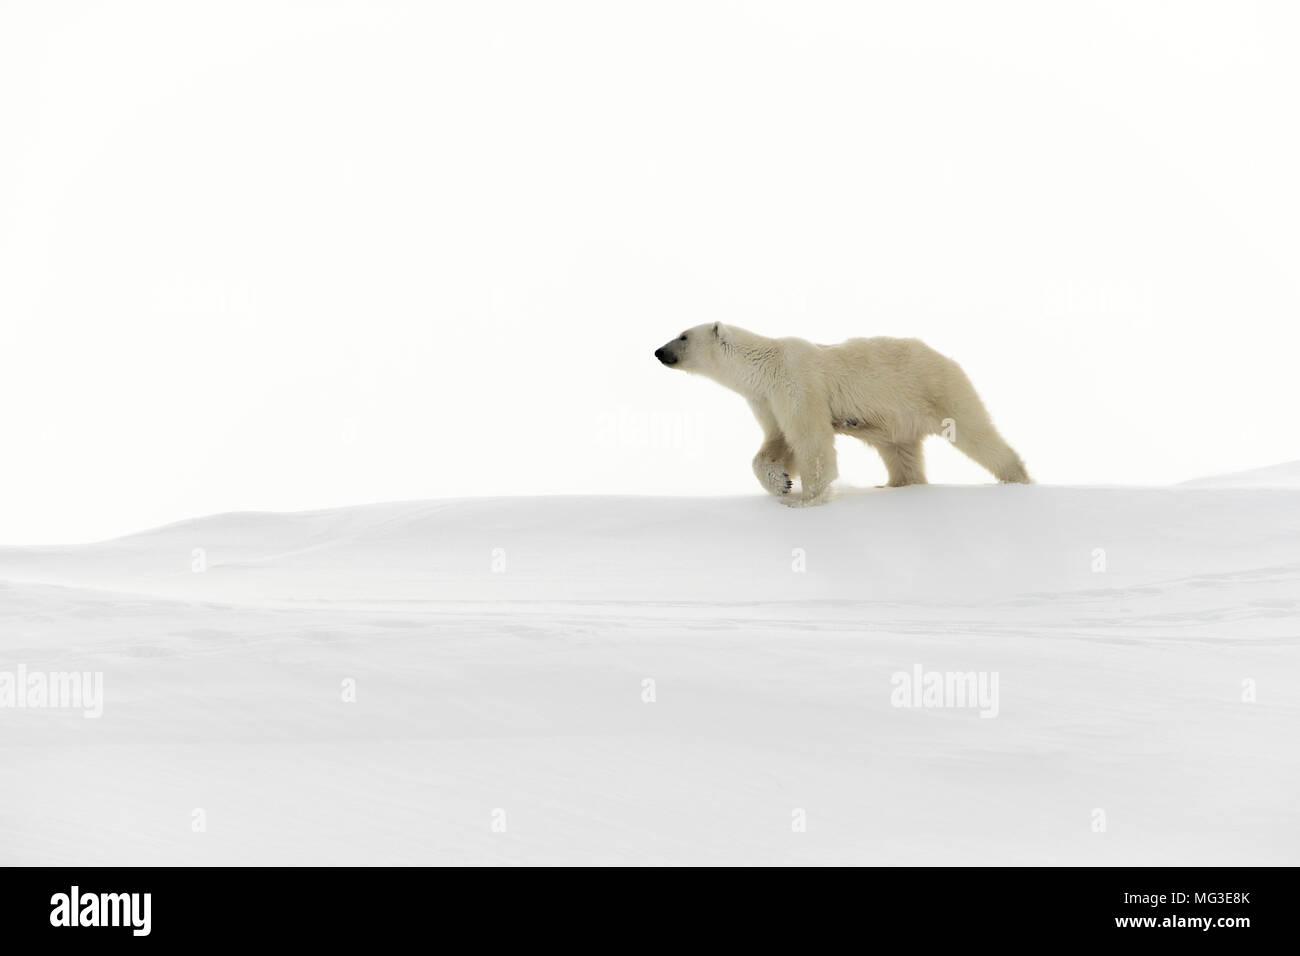 Mature adult female polar bear walks across the snow on top of an iceberg.  Baffin Island, Nunavut, Canada, Arctic - Stock Image